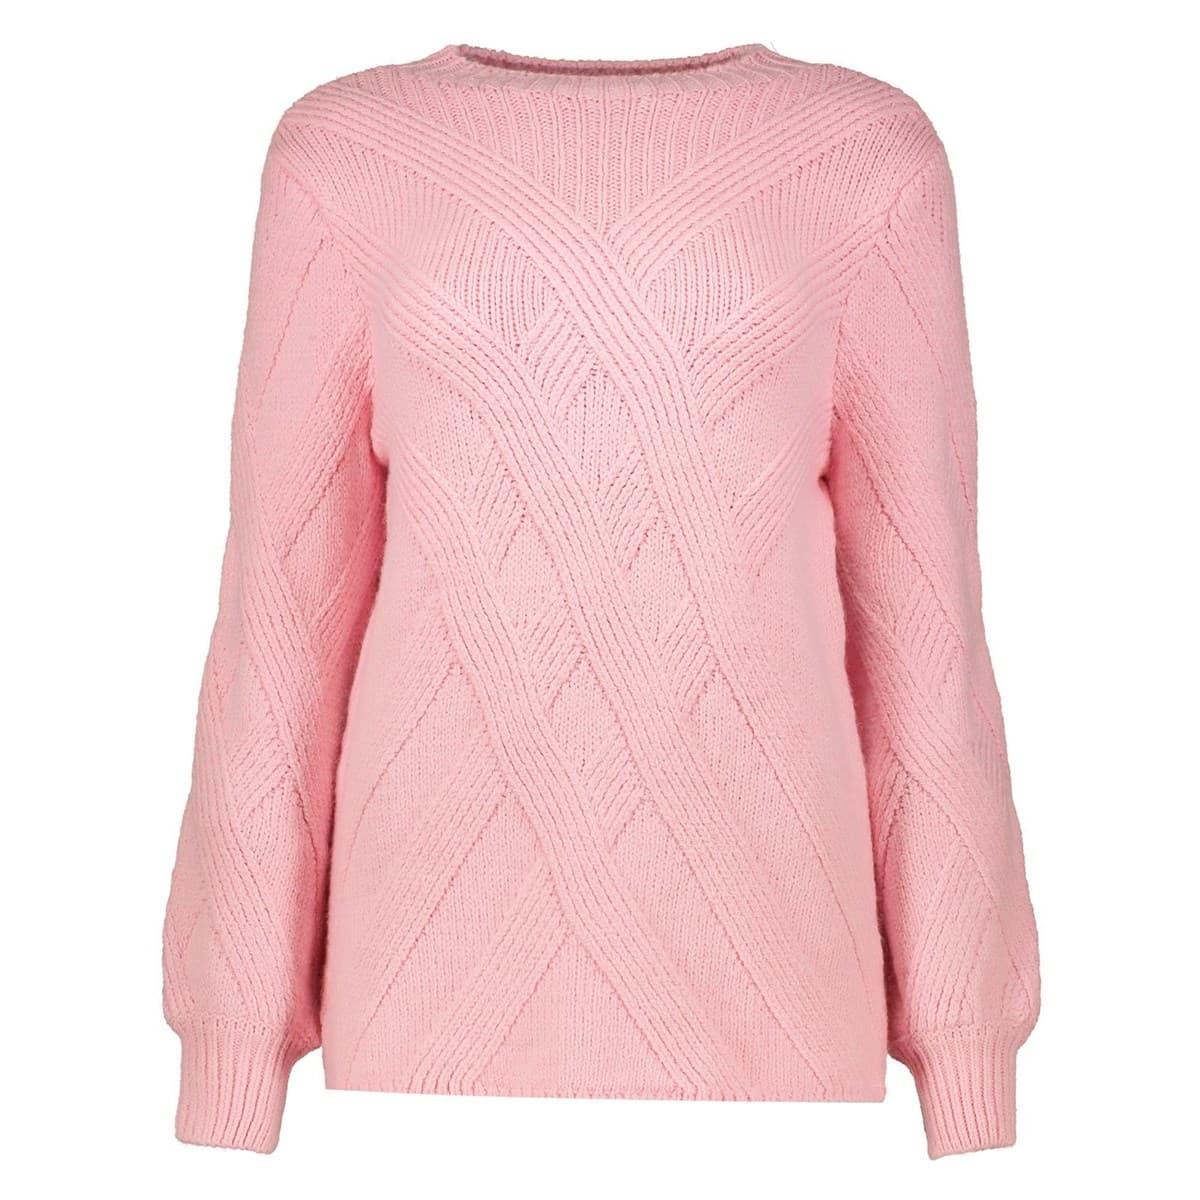 Onlluv L/s Pullover Knt